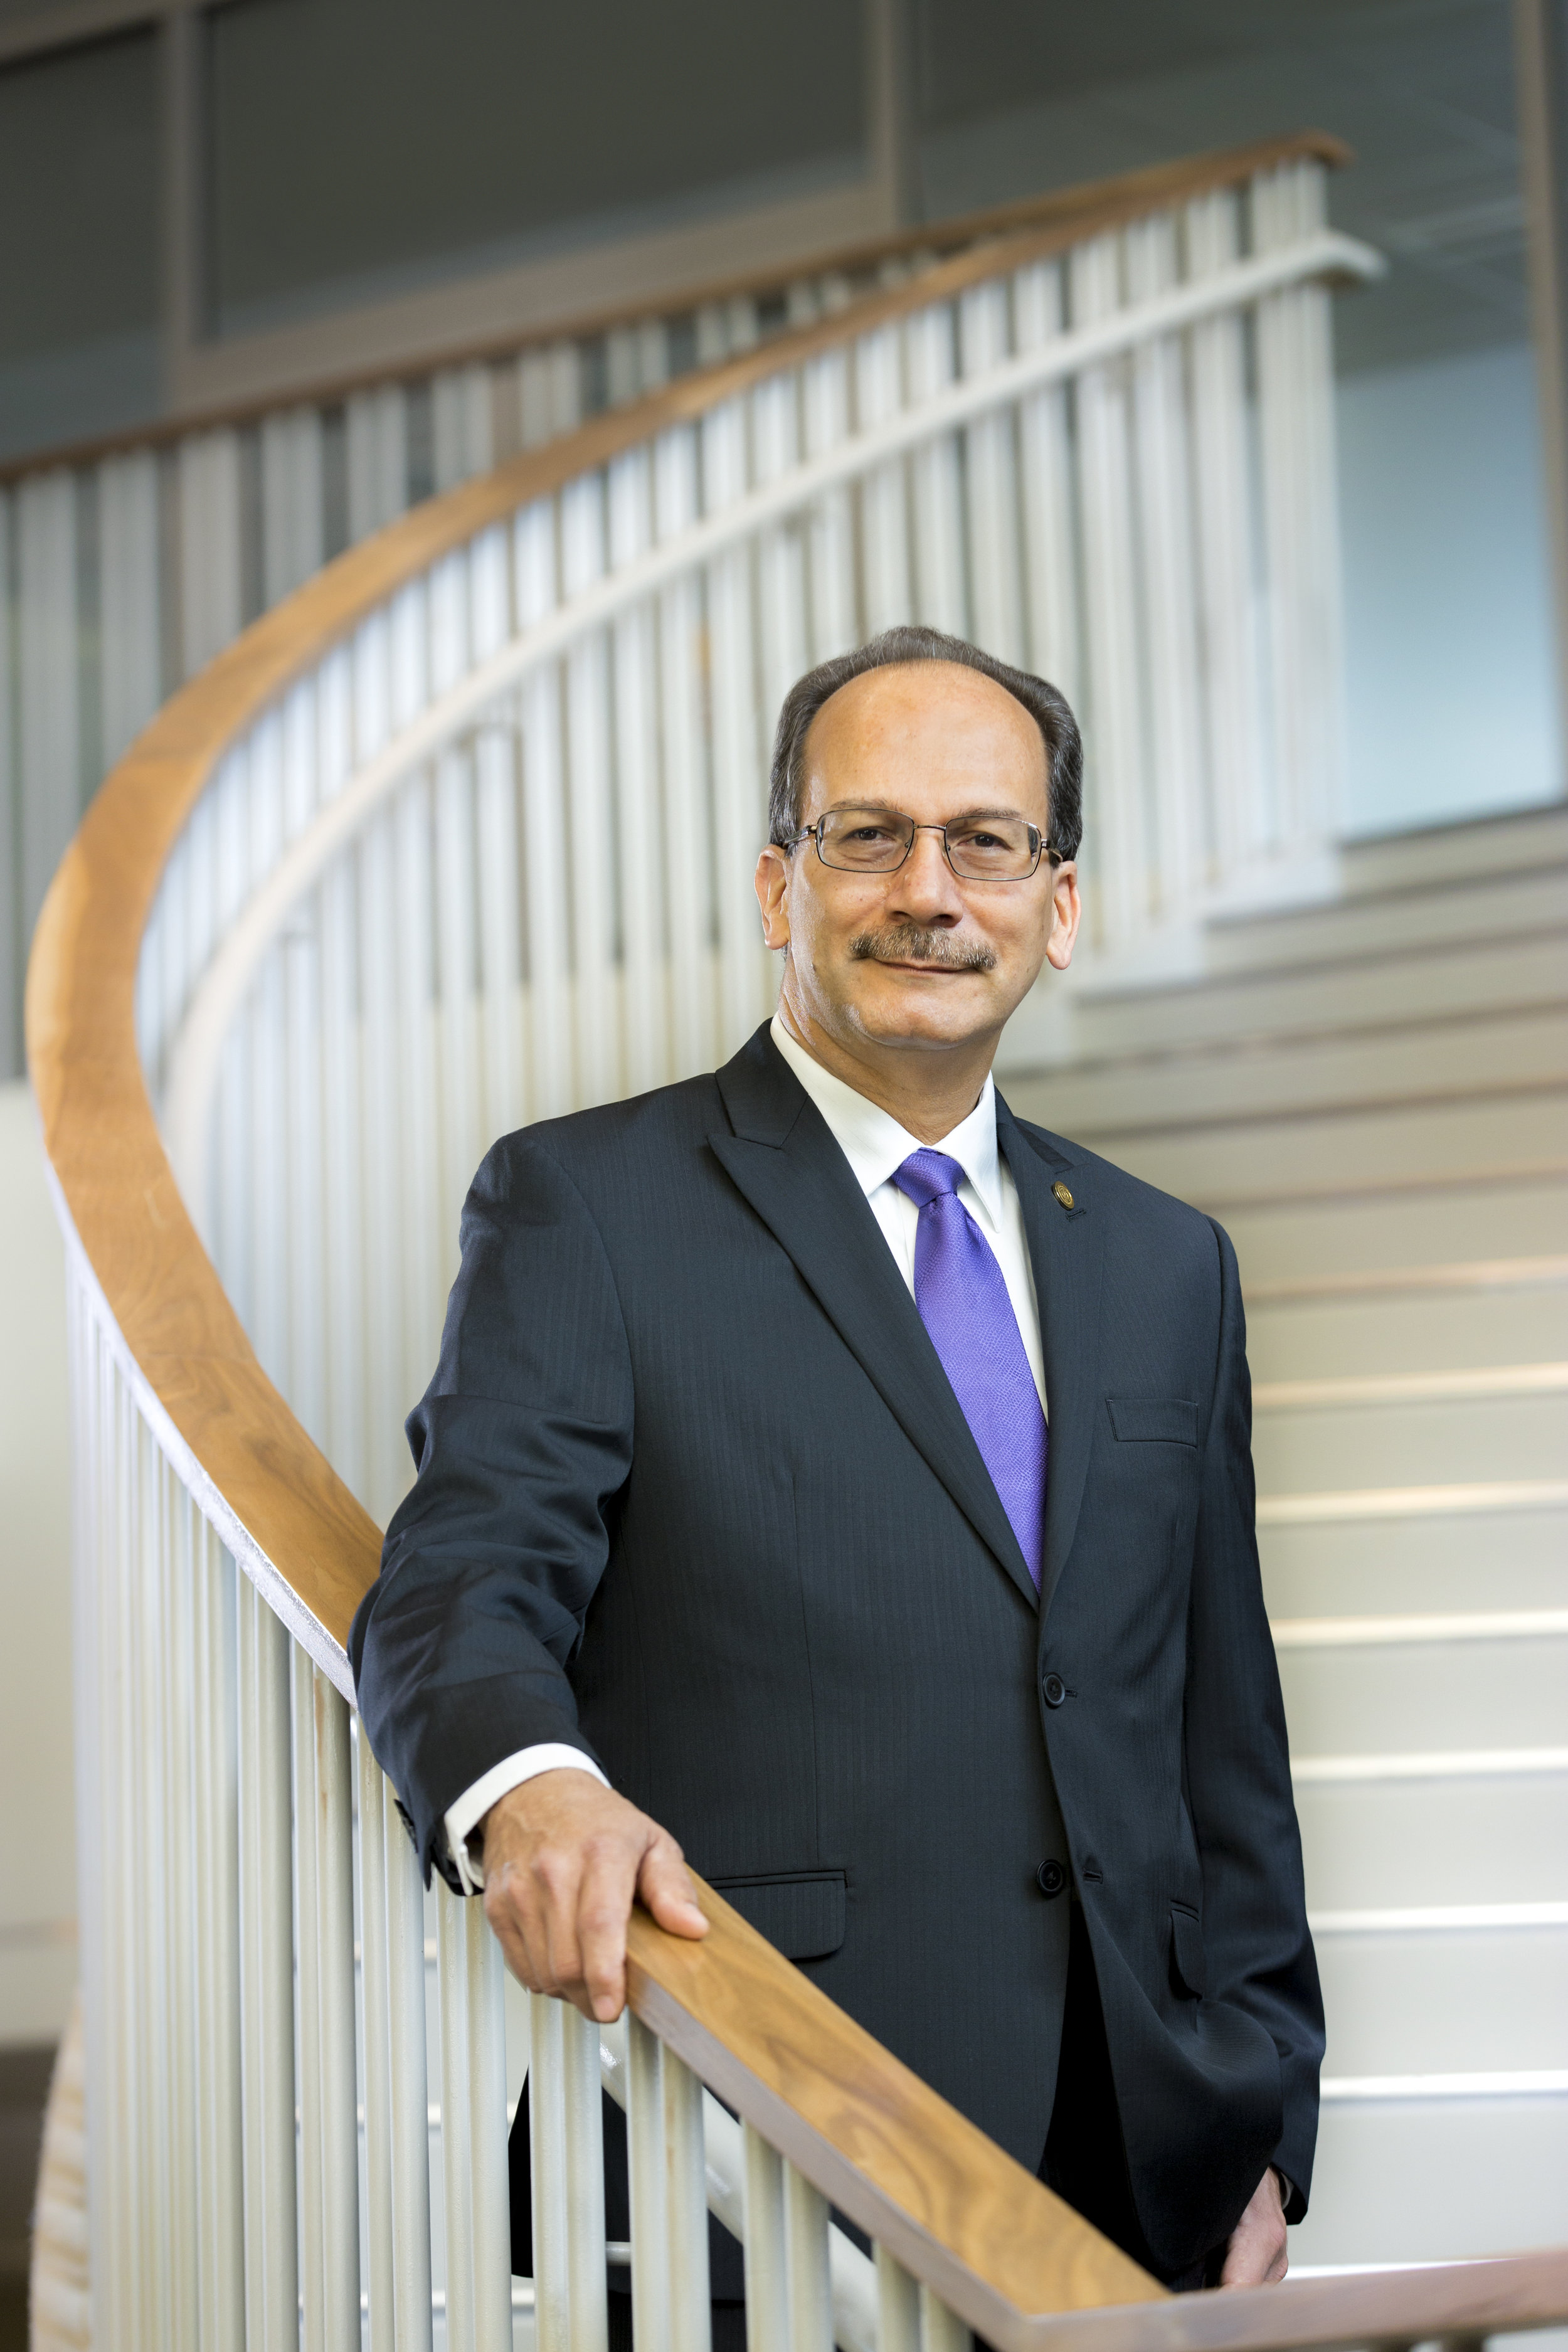 Dr. Havidán Rodrígruez - President, University at Albany ( @HavidanUAlbany)